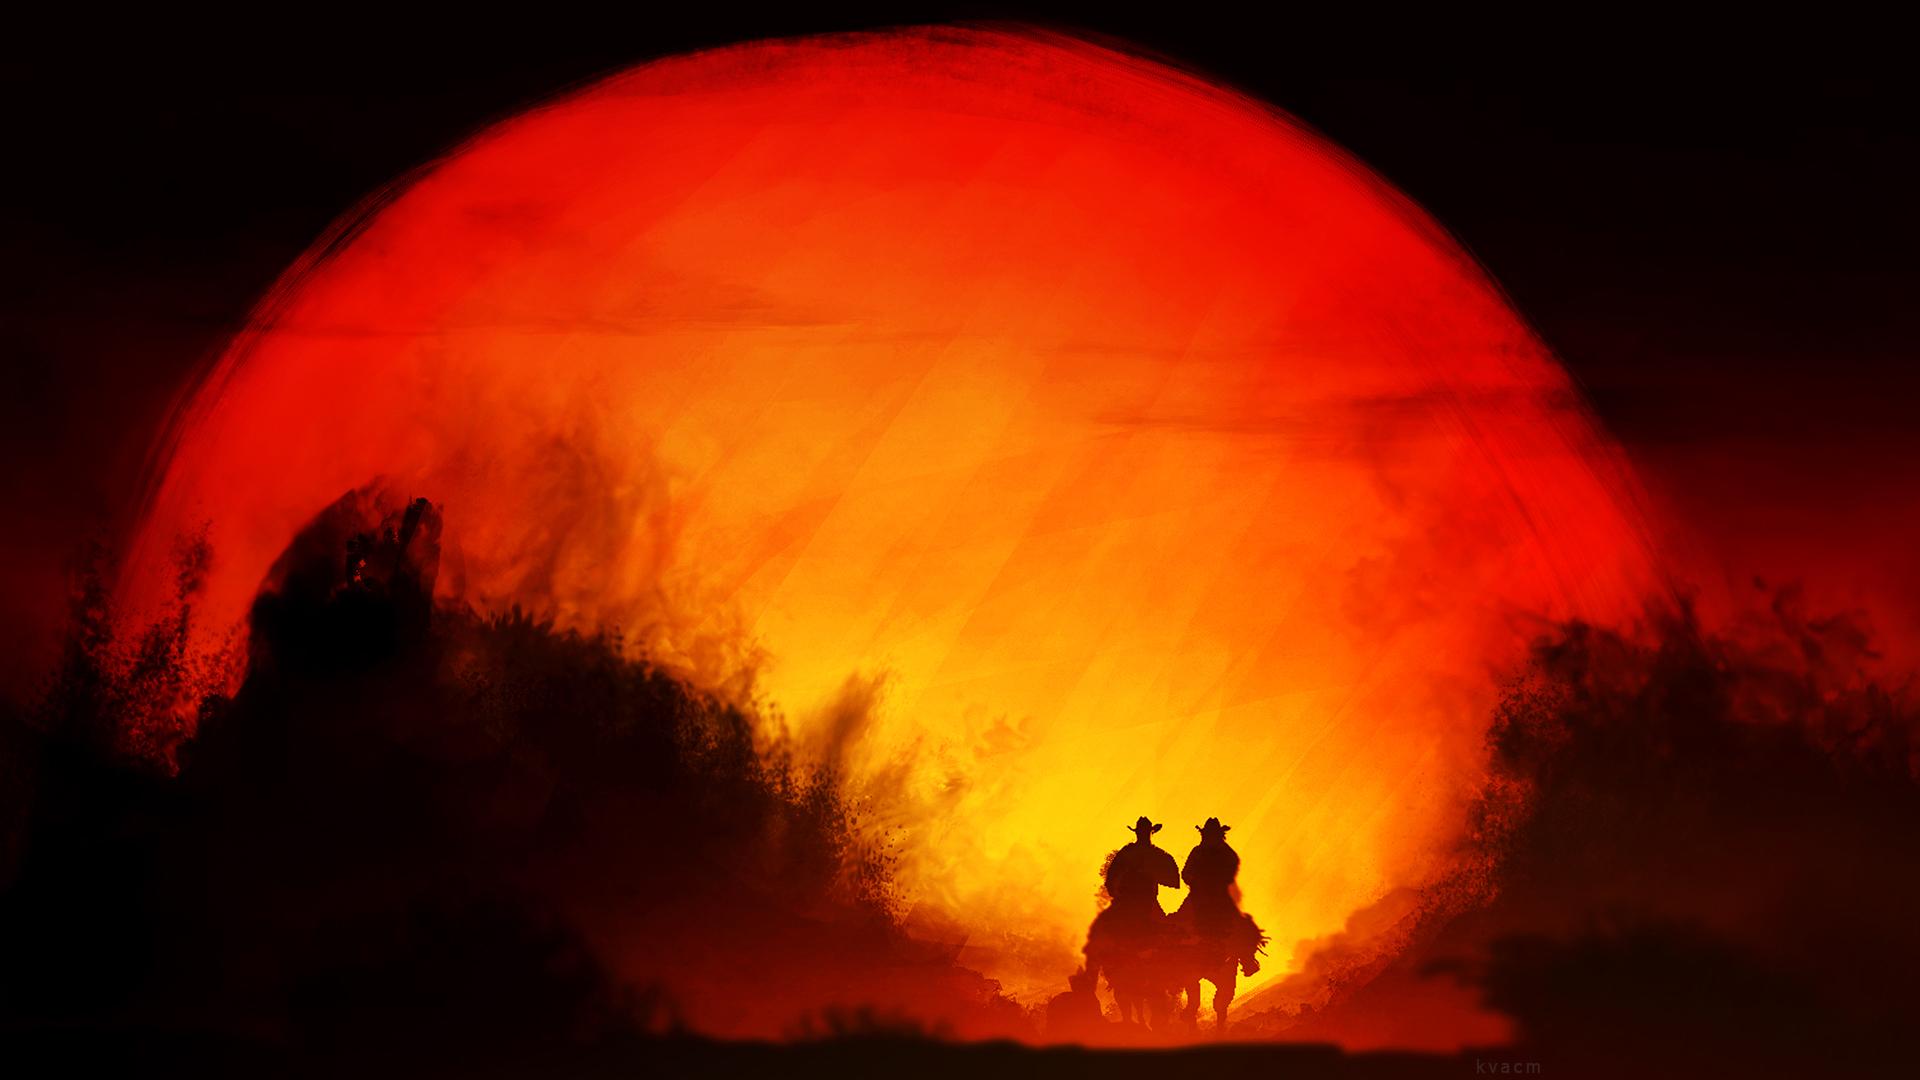 Red Dead Redemption Fanart Hd Games 4k Wallpapers Images